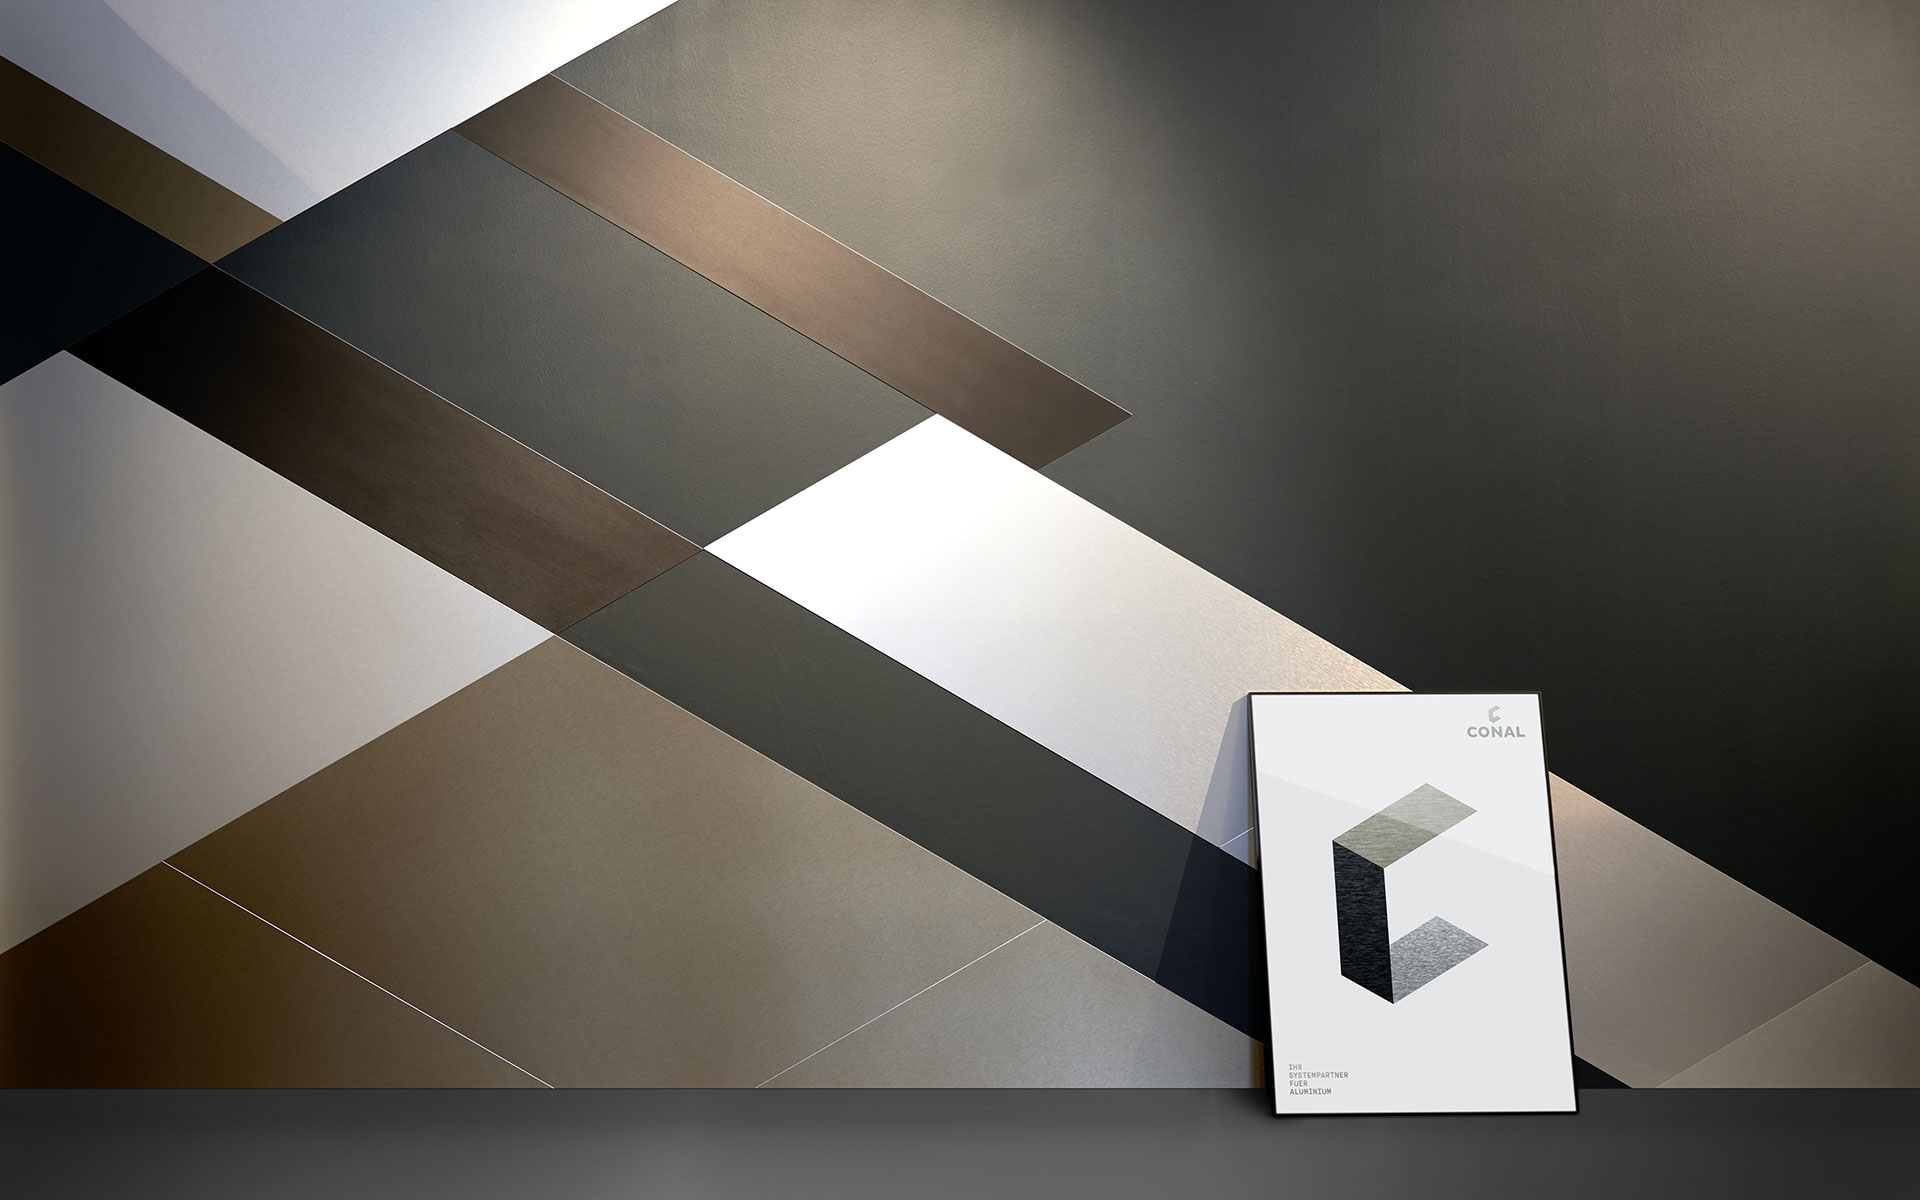 conal corporate design 2